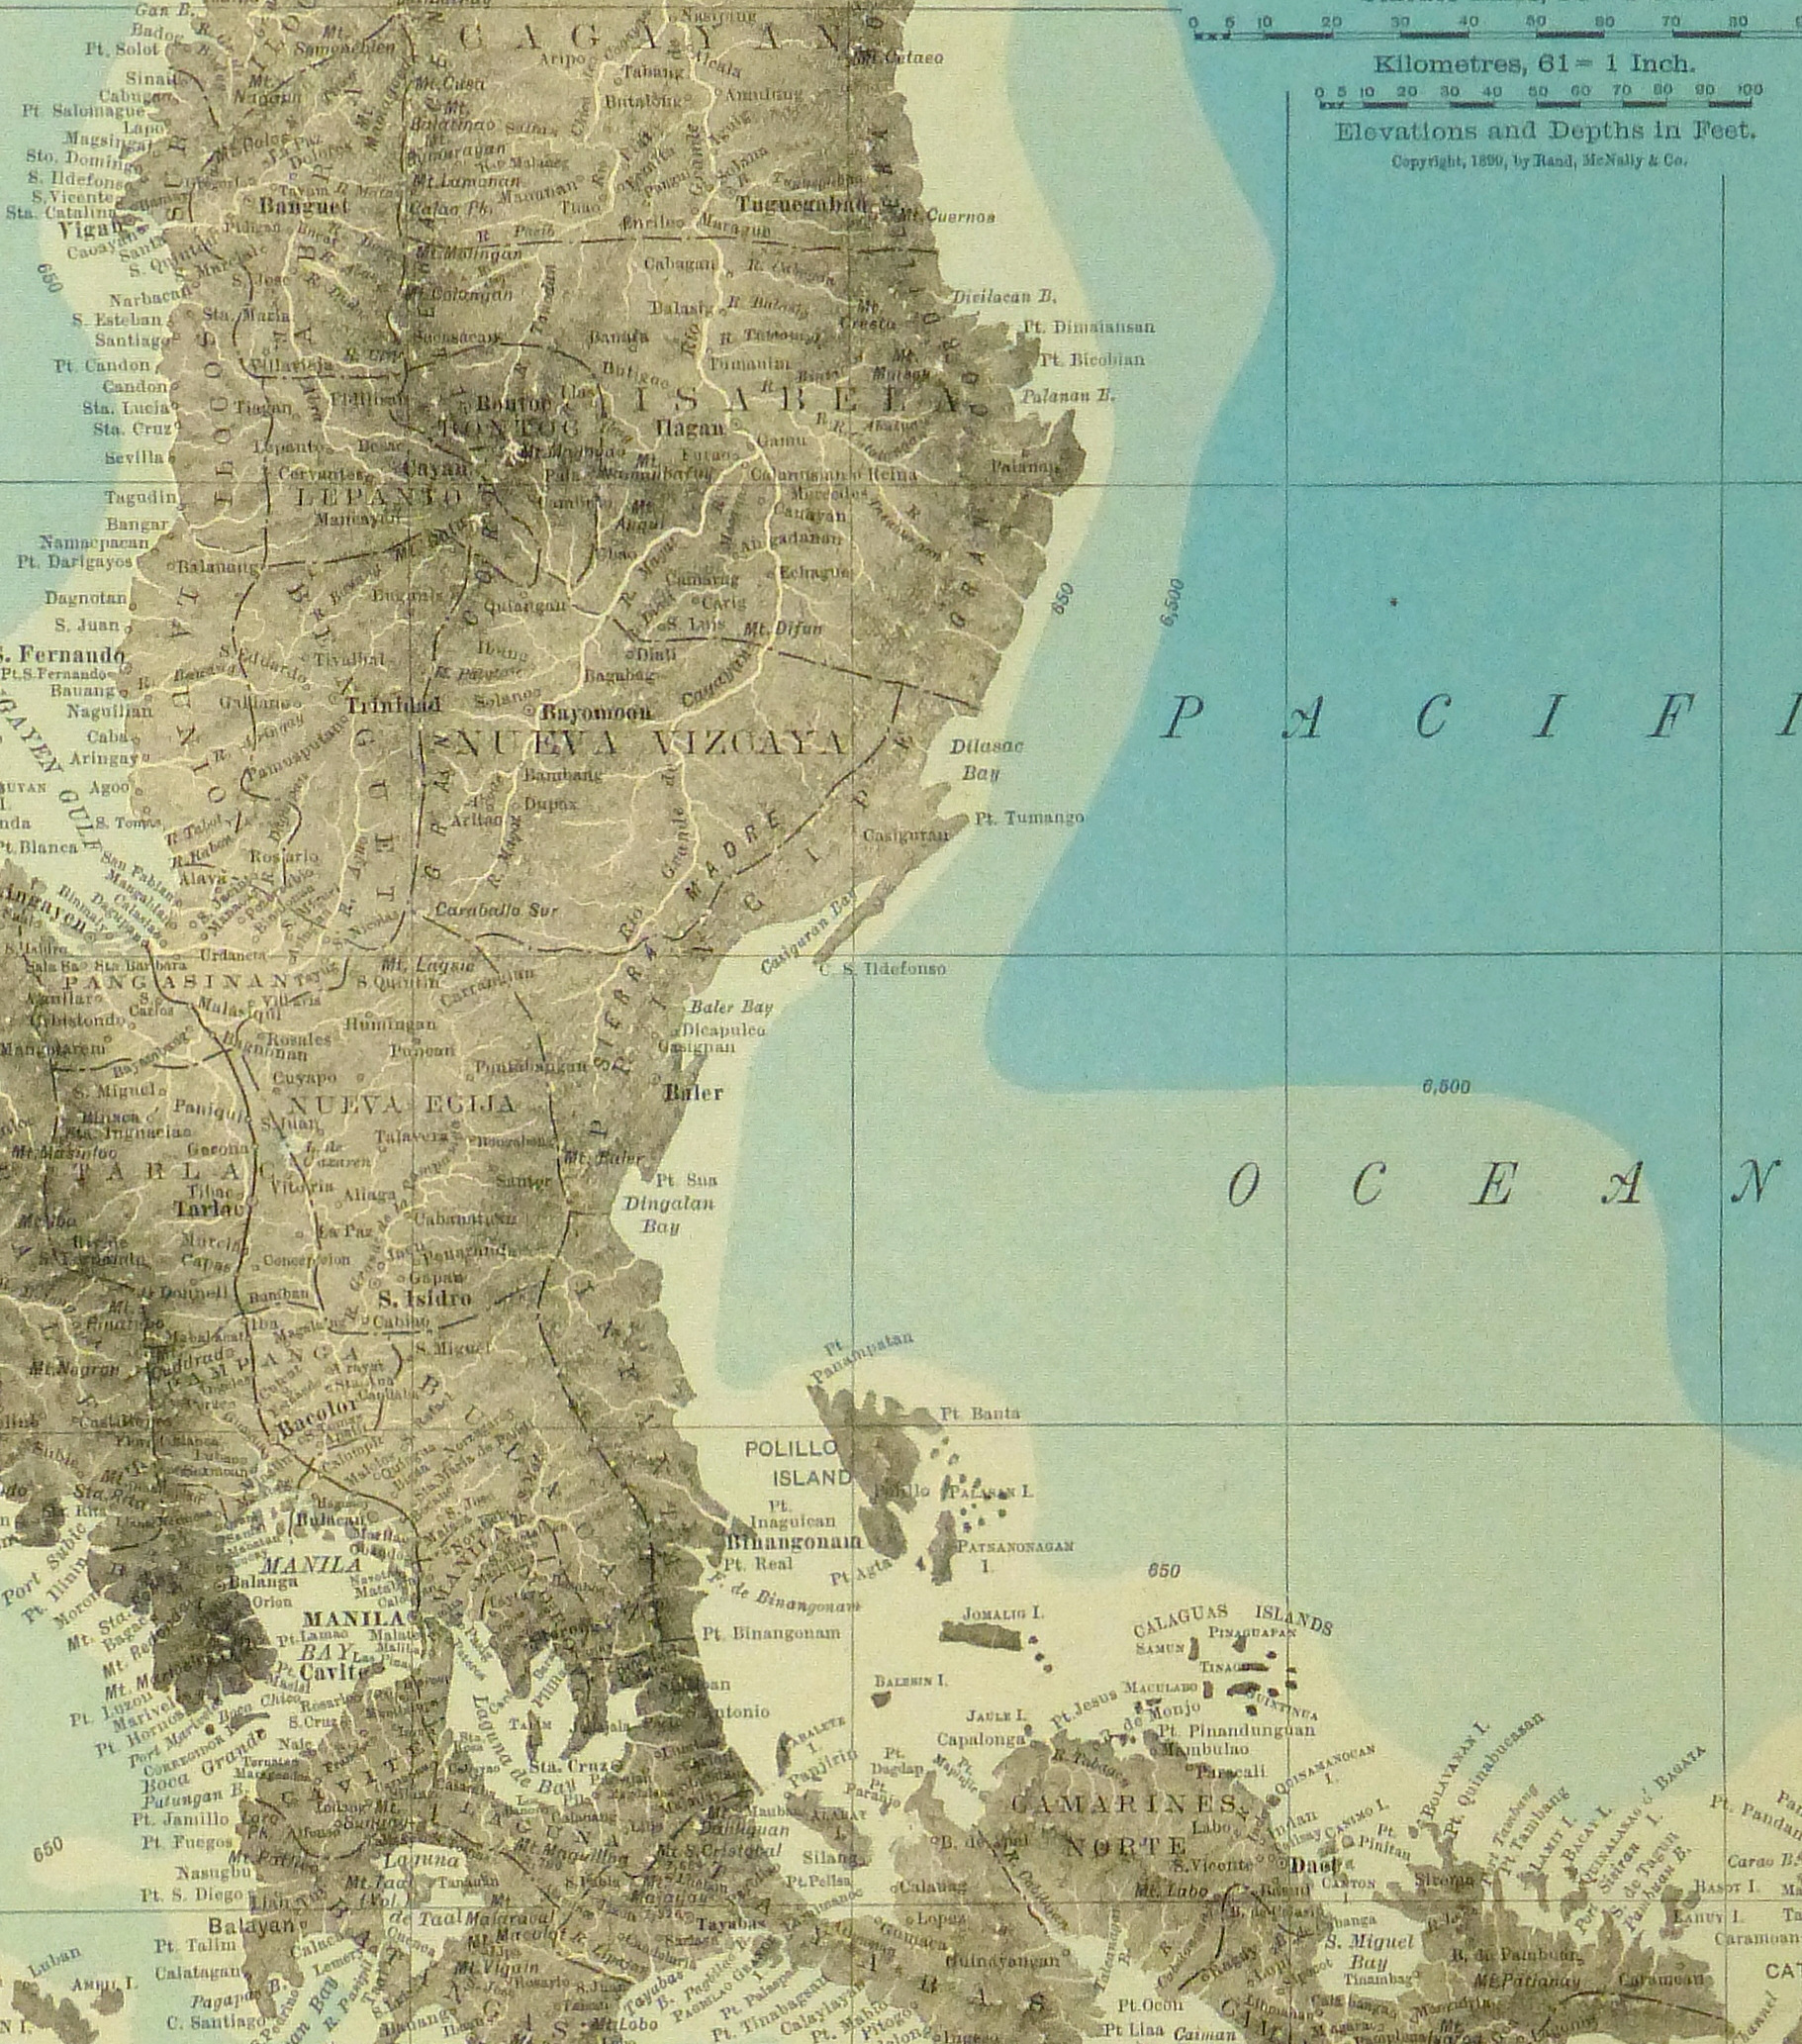 Luzon Island, Philippines Map, 1895-detail-8557K